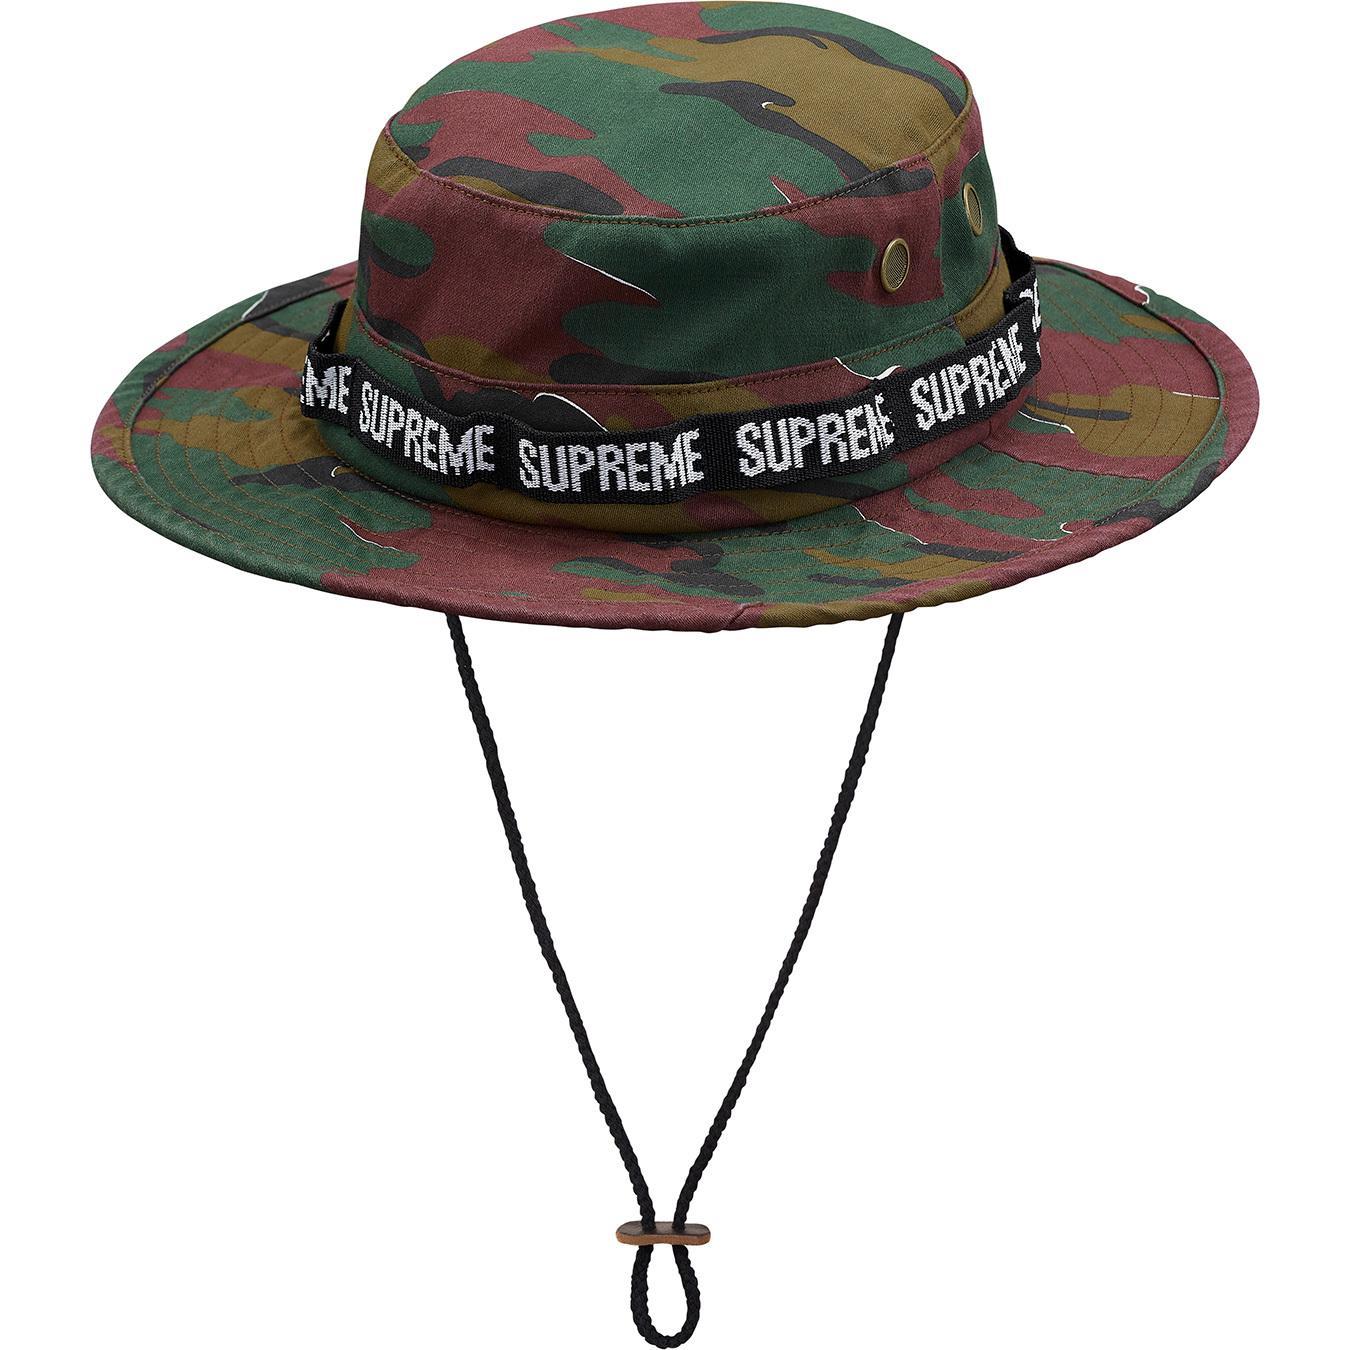 Lyst - Supreme Military Boonie Jigsaw Camo for Men e6964e09fd2a